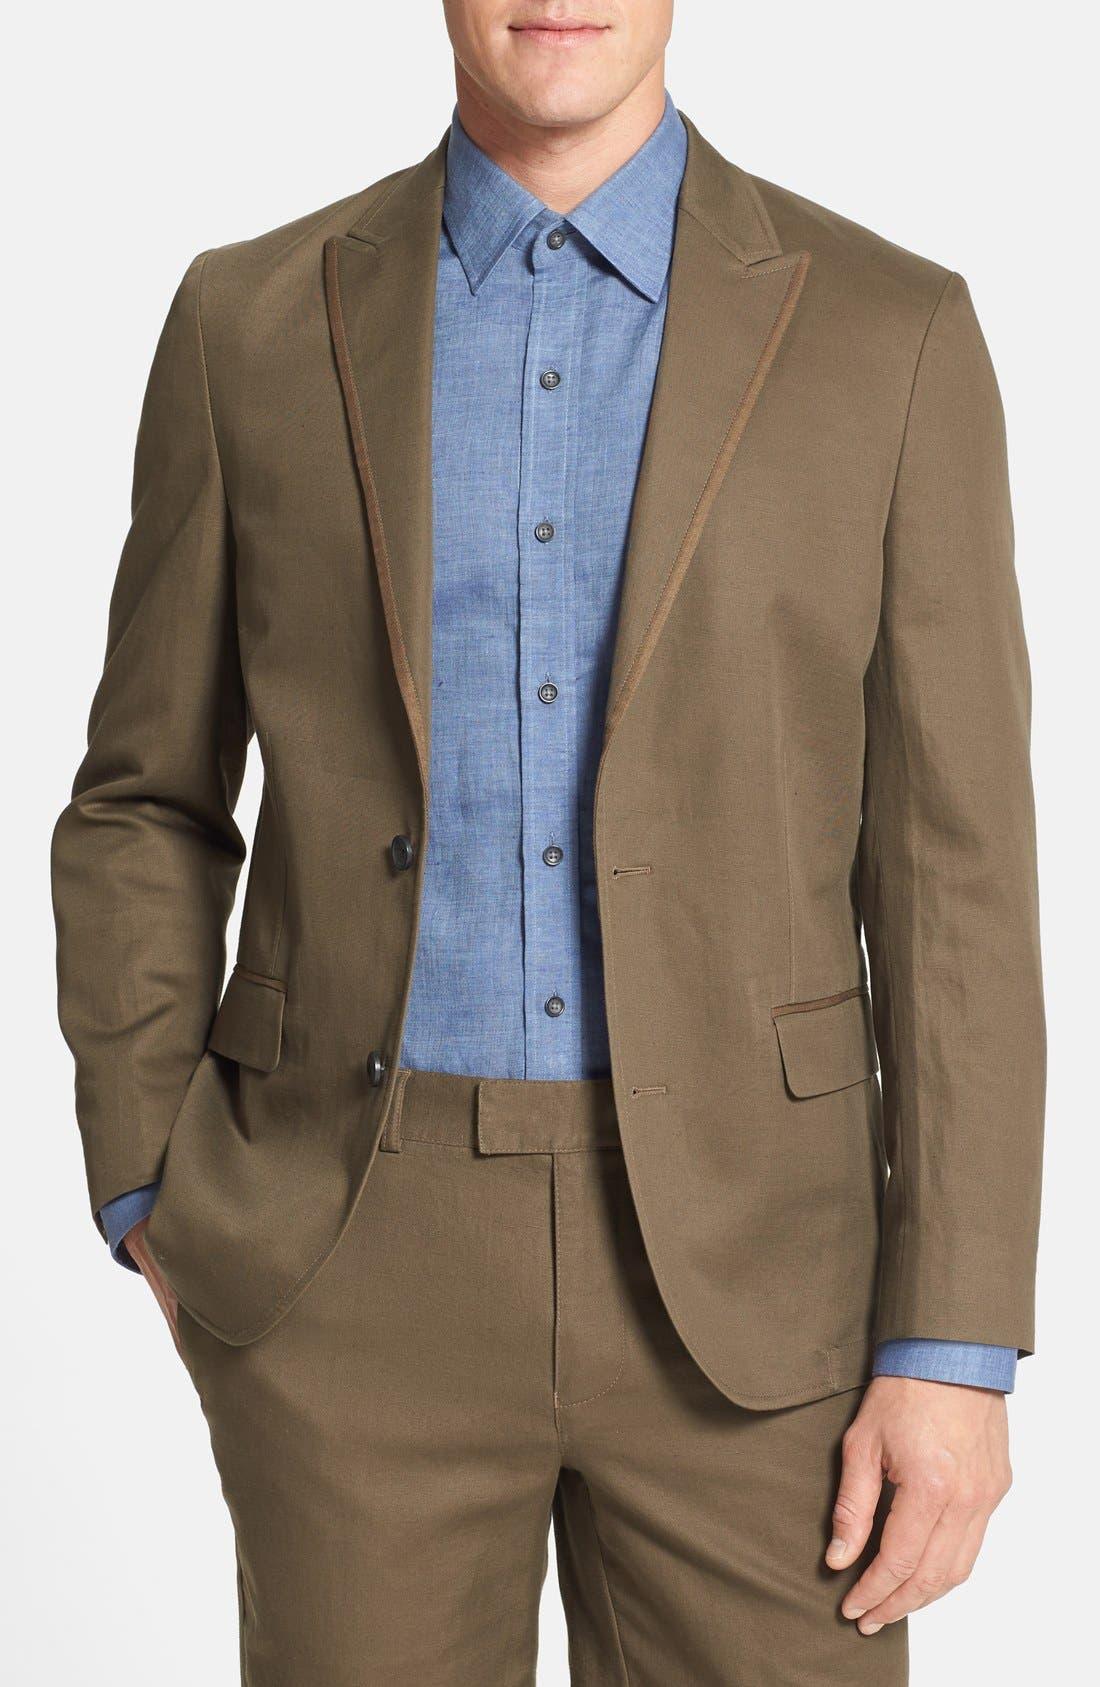 Alternate Image 1 Selected - Vince Camuto Slim Fit Cotton & Linen Blazer